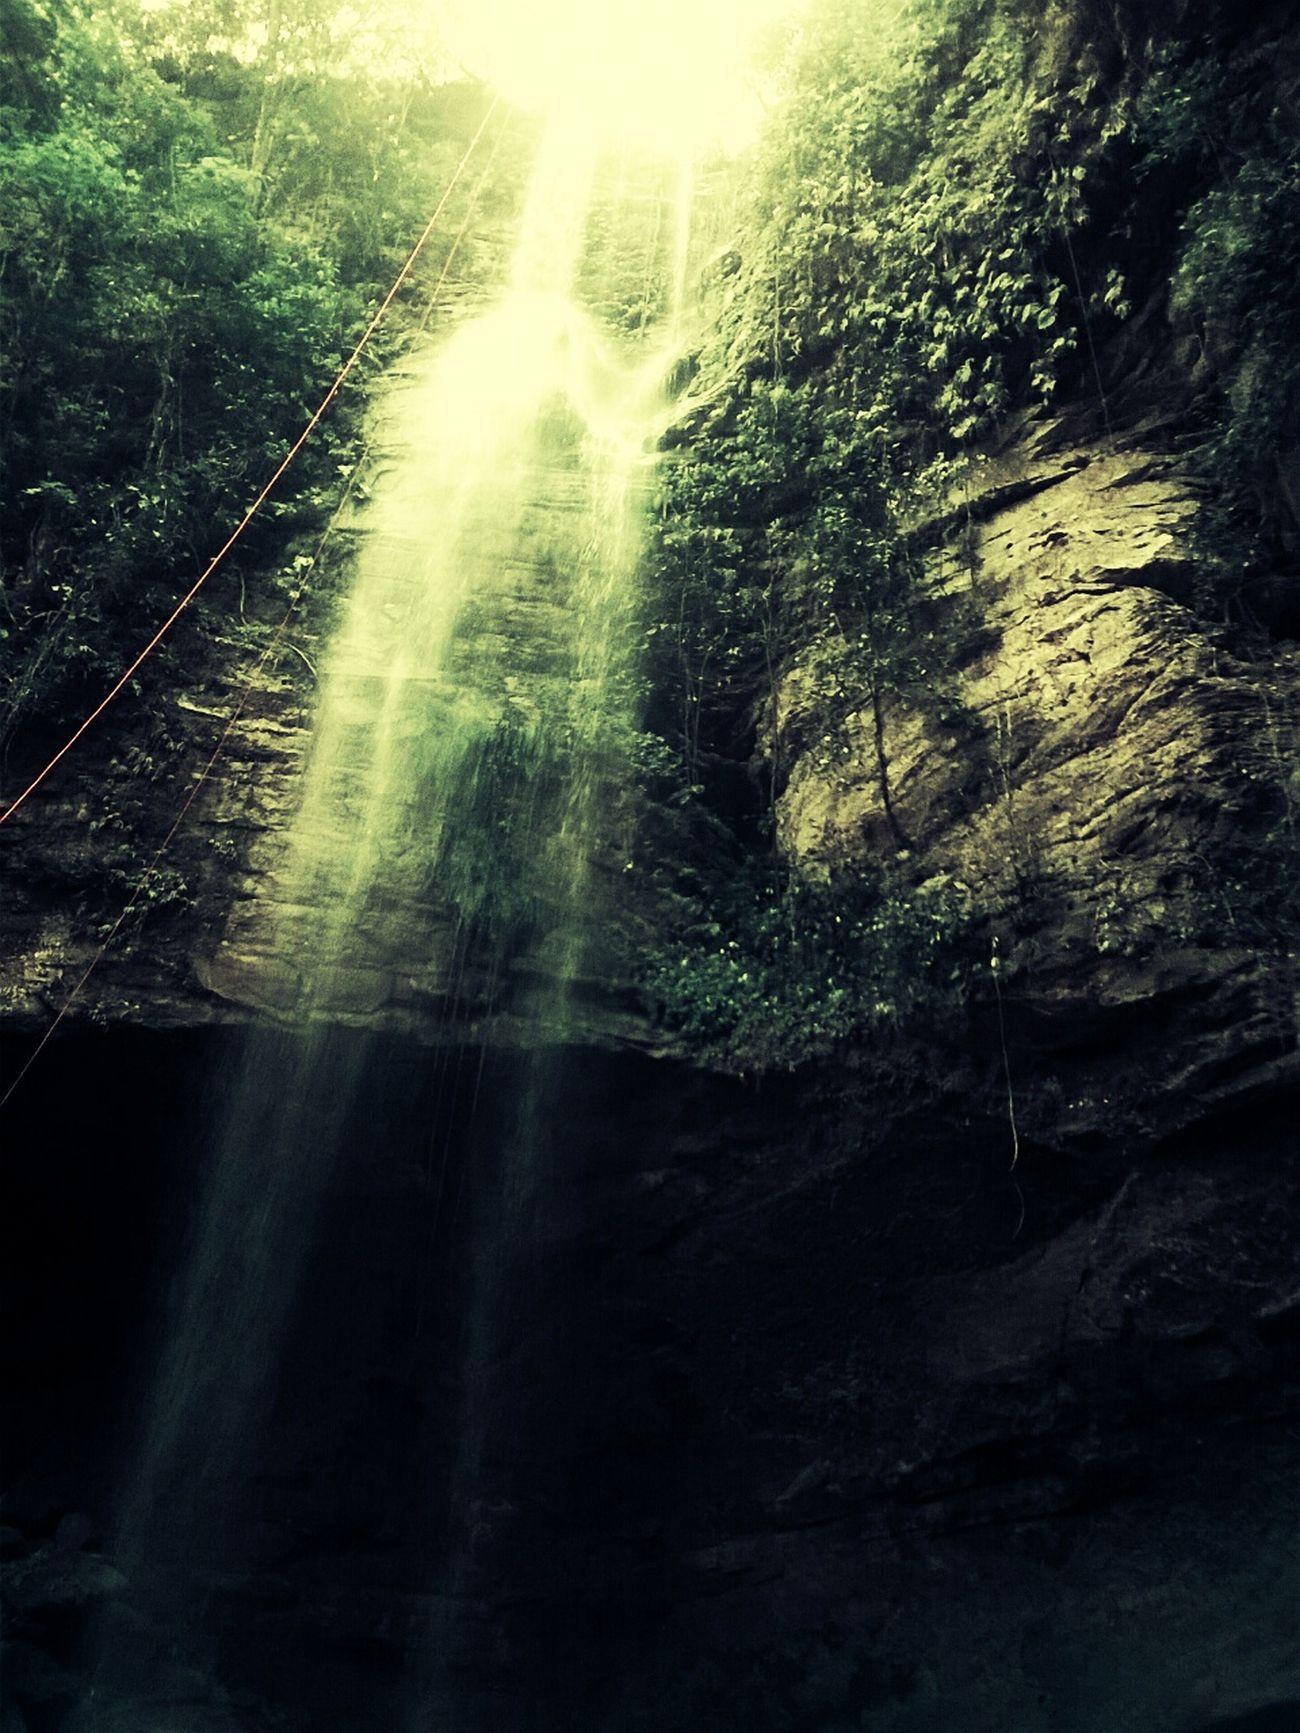 Cachoeira Serradocarmo Brasil LoveNature LoveNatureAndMountain